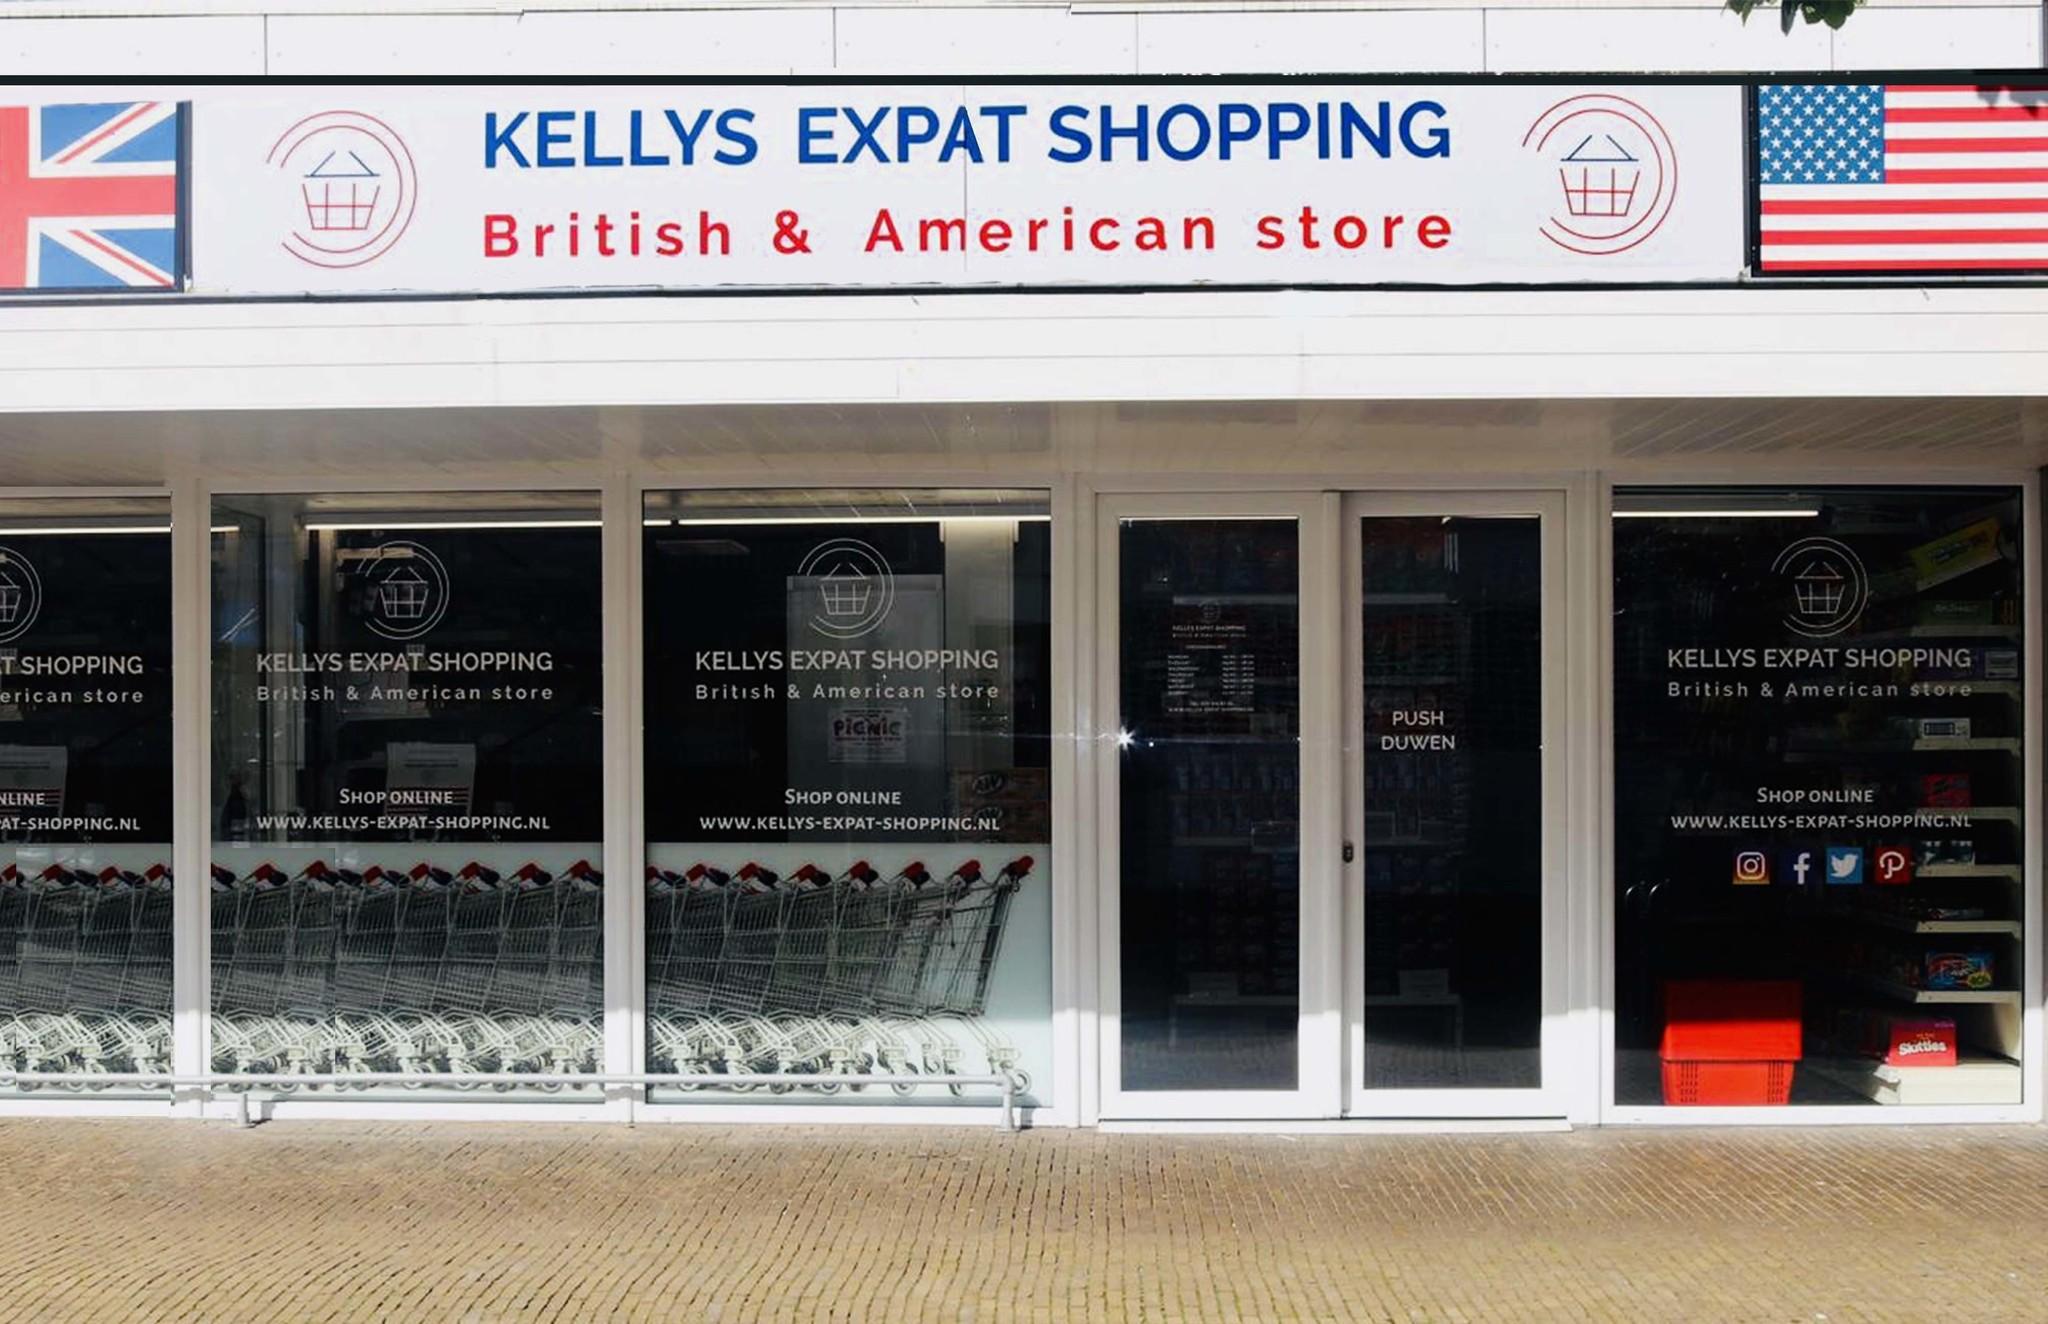 Kellys Expat Shopping Wassenaar | British & American Grocery Store